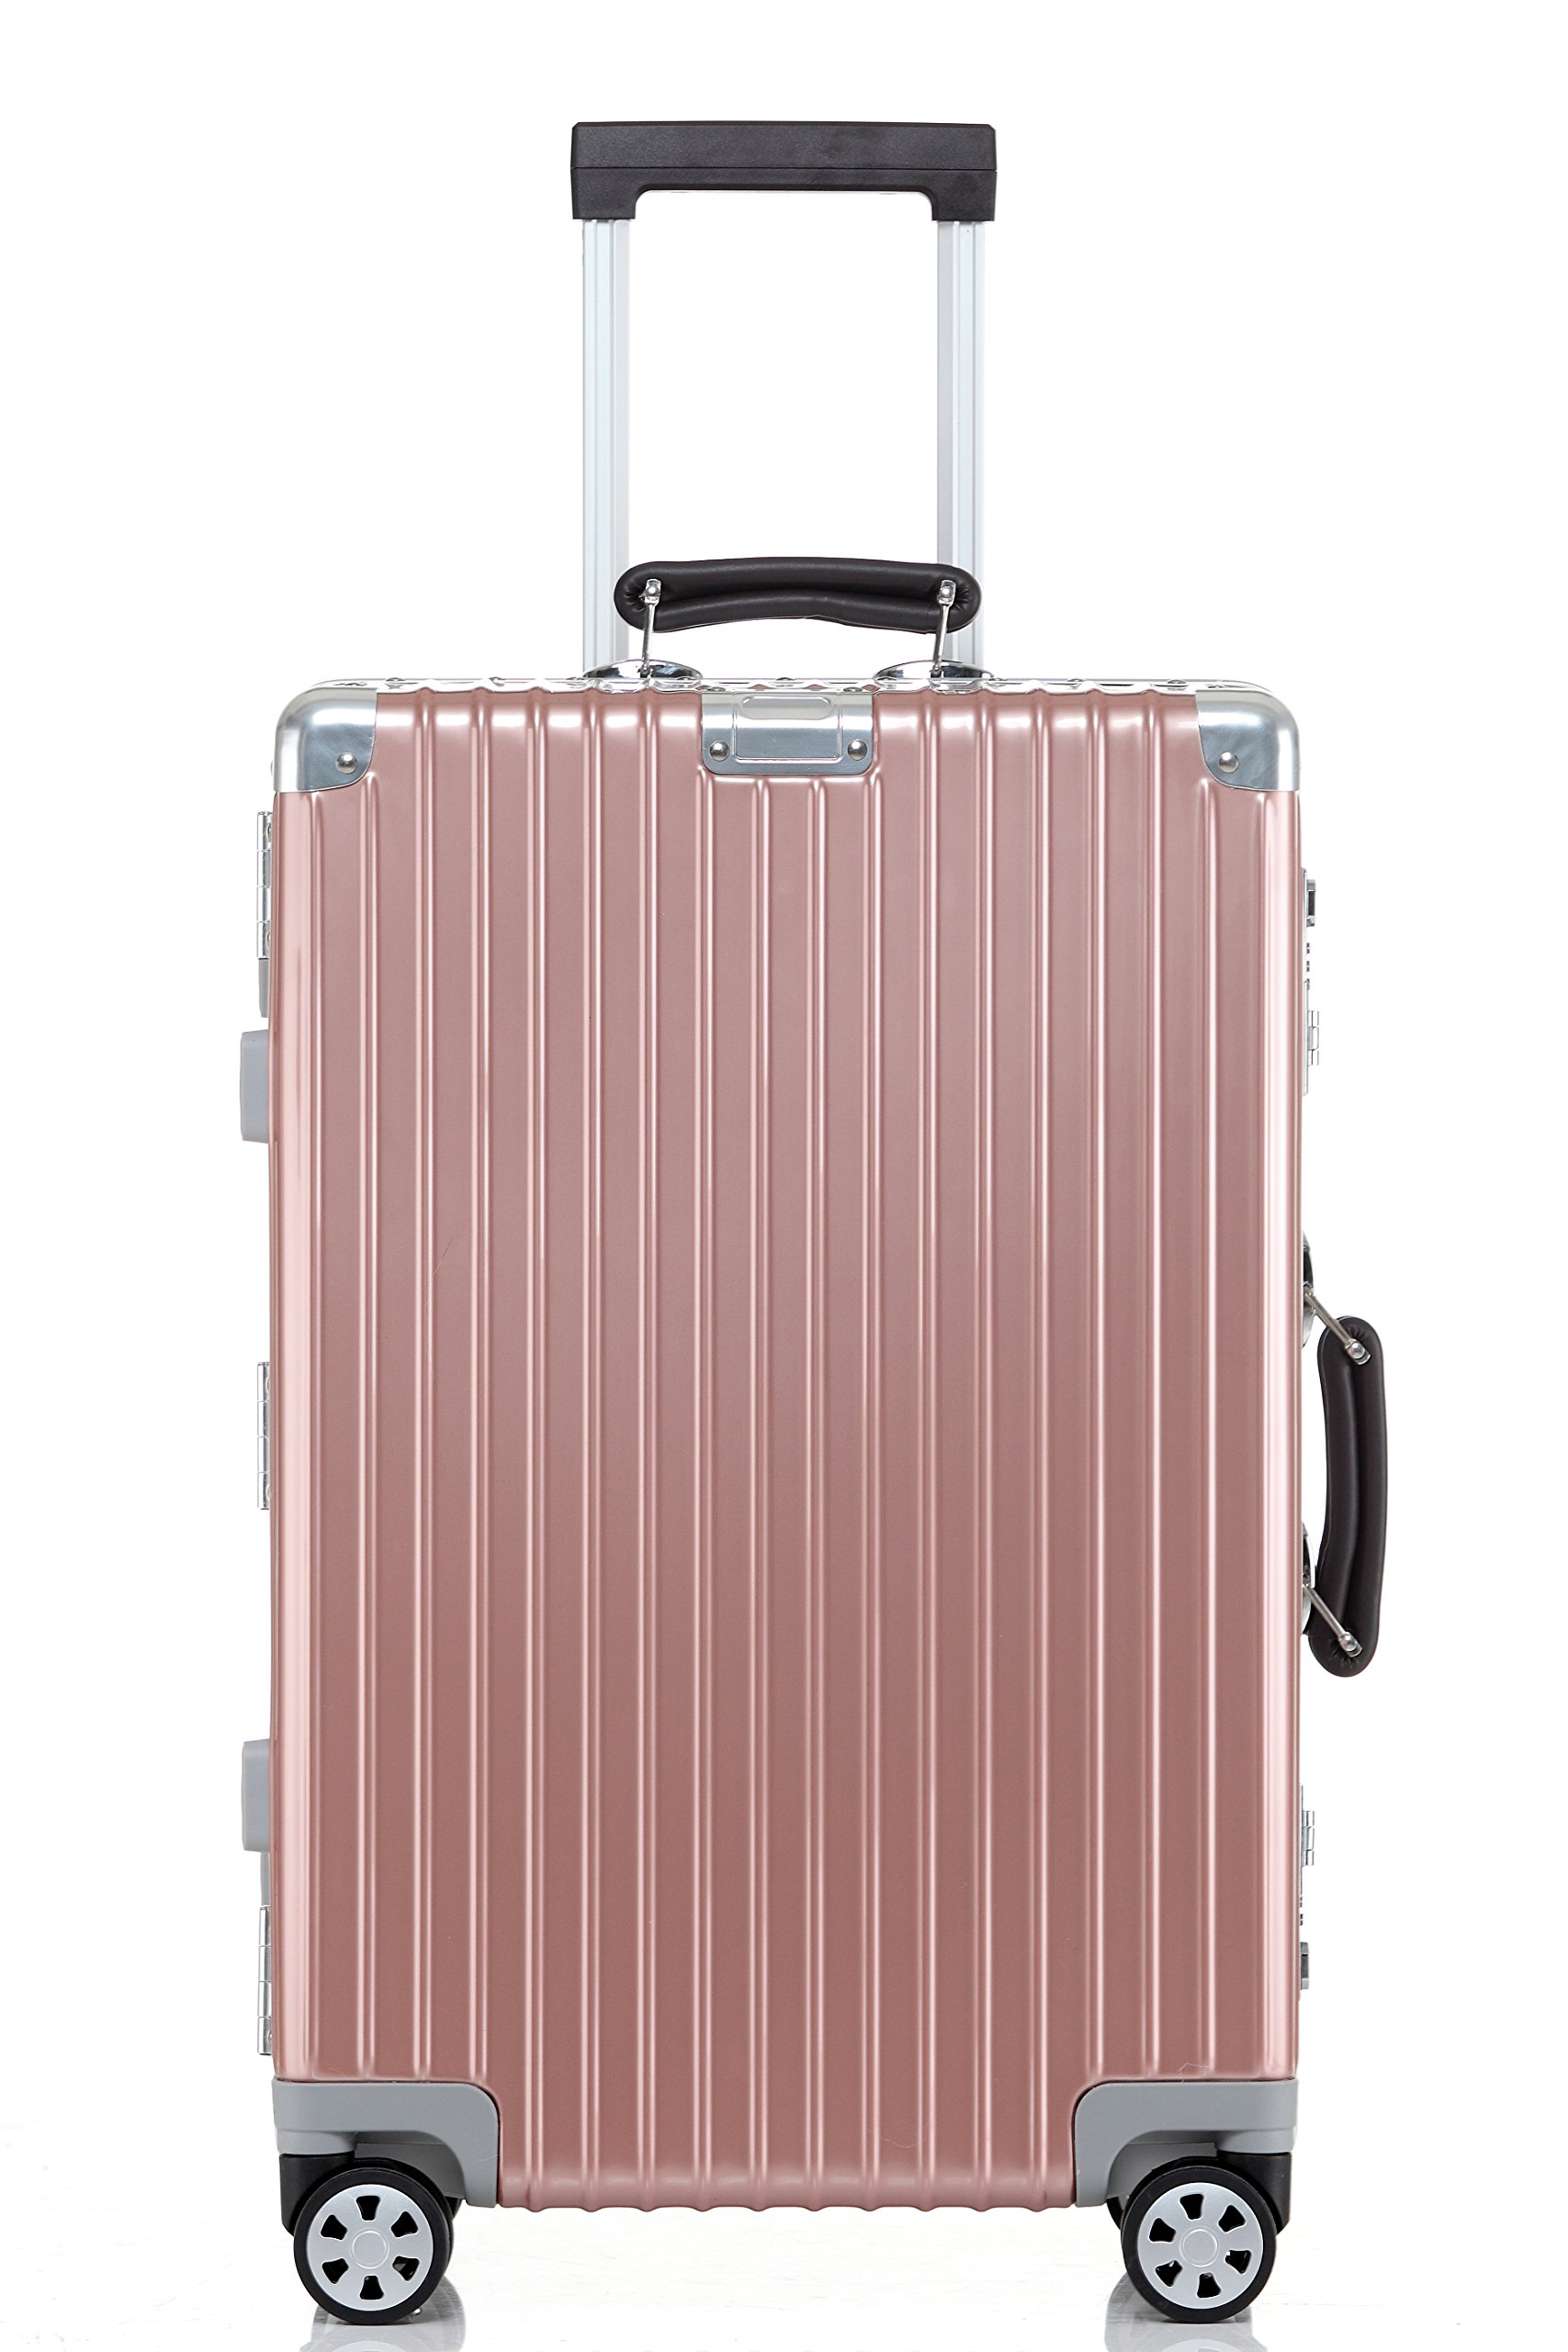 Checked Luggage, Clothink Aluminum Frame Hardside Suitcase Modern Travel Spinner 28 Inch, Rose Gold by Clothink